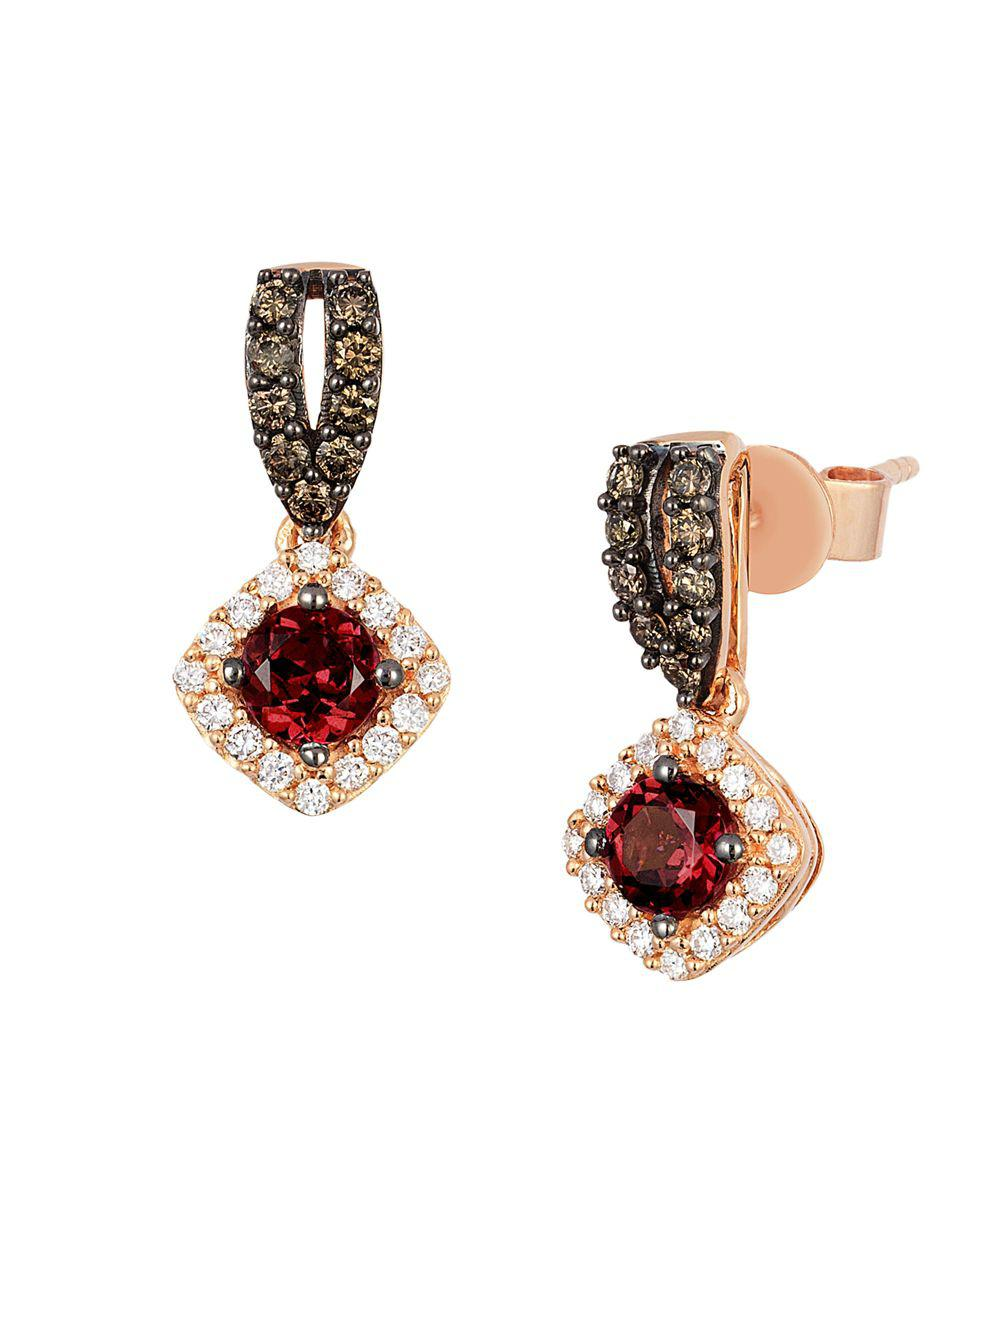 fff34b0f5 Le Vian. Women's Metallic 14k Strawberry Gold Raspberry Rhodolite Vanilla  Diamonds & Chocolate Diamonds Square Drop Earrings